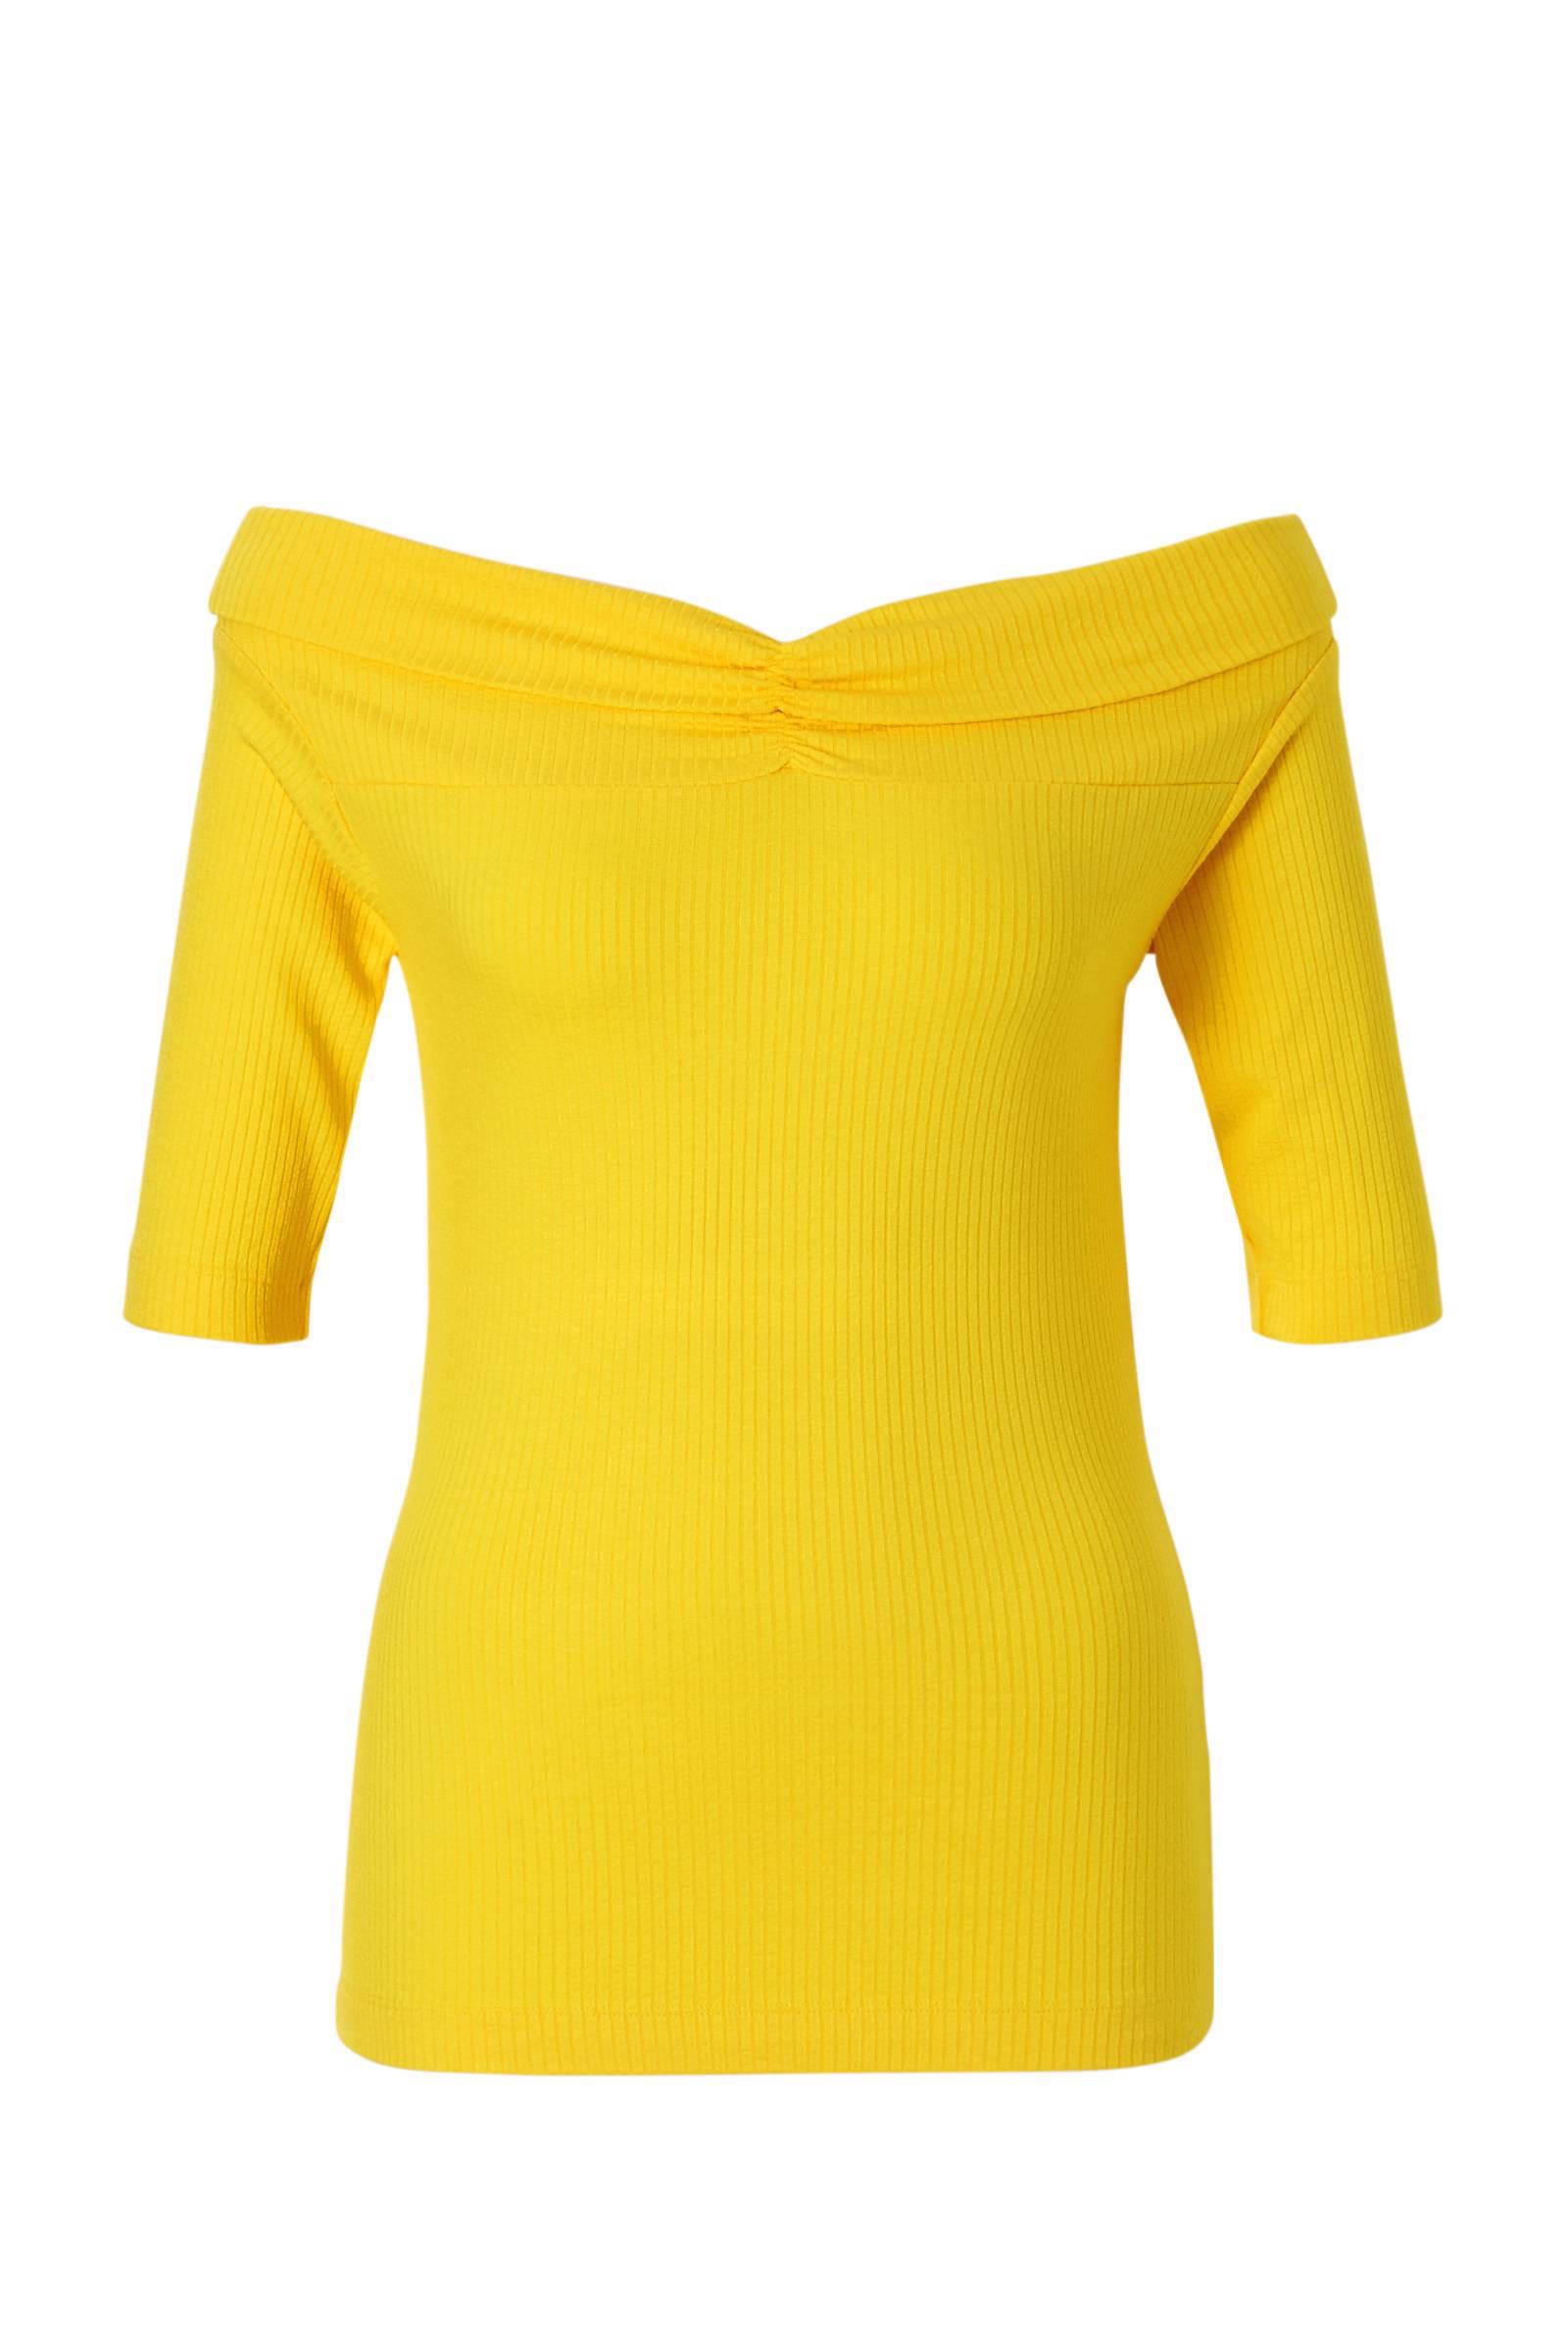 whkmp's own off-shoulder rib top (dames)